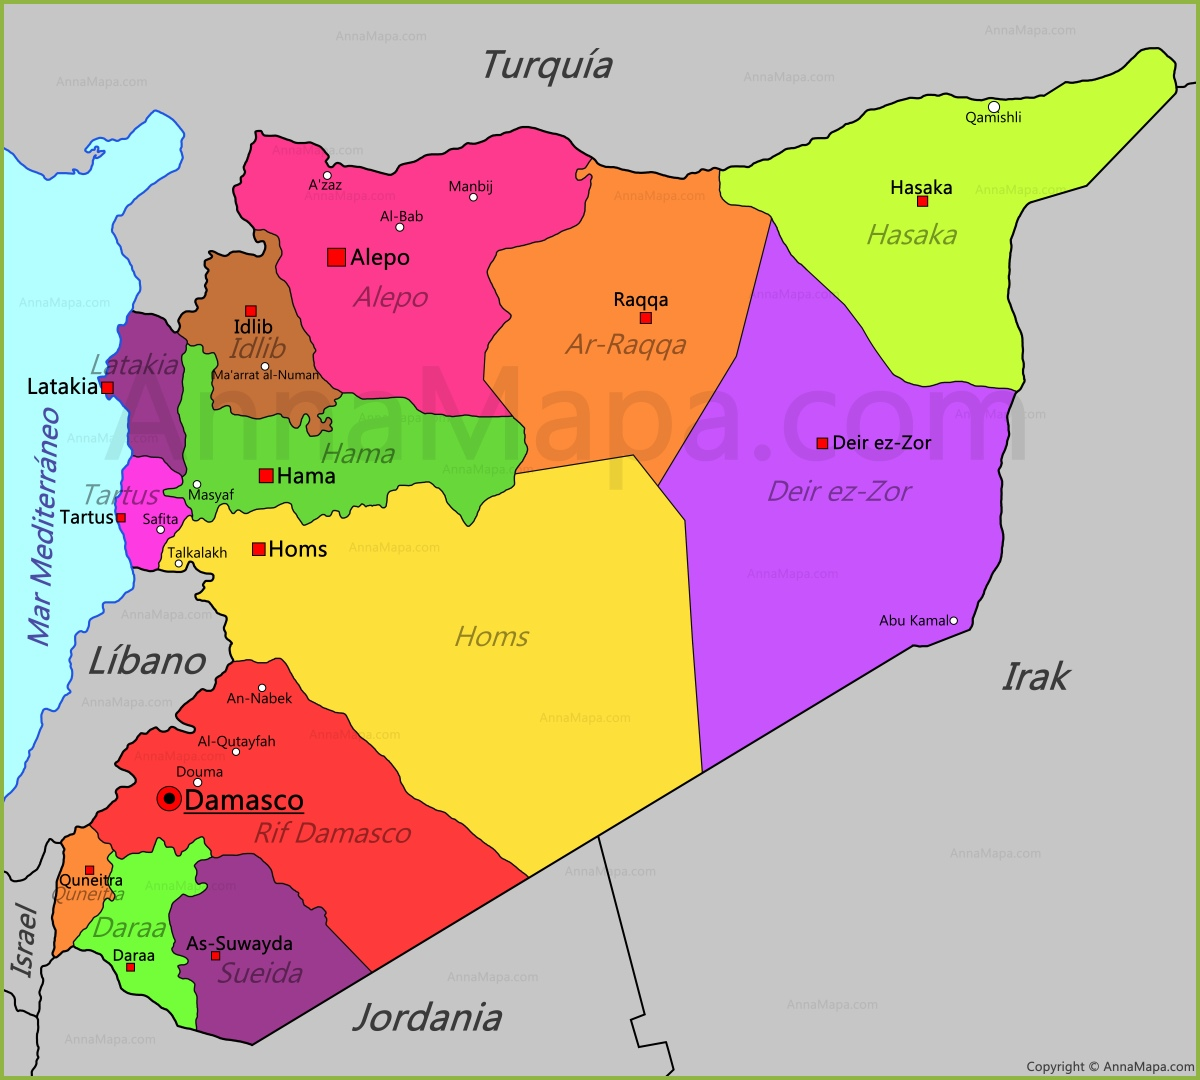 siria mapa Mapa de Siria   AnnaMapa.com siria mapa